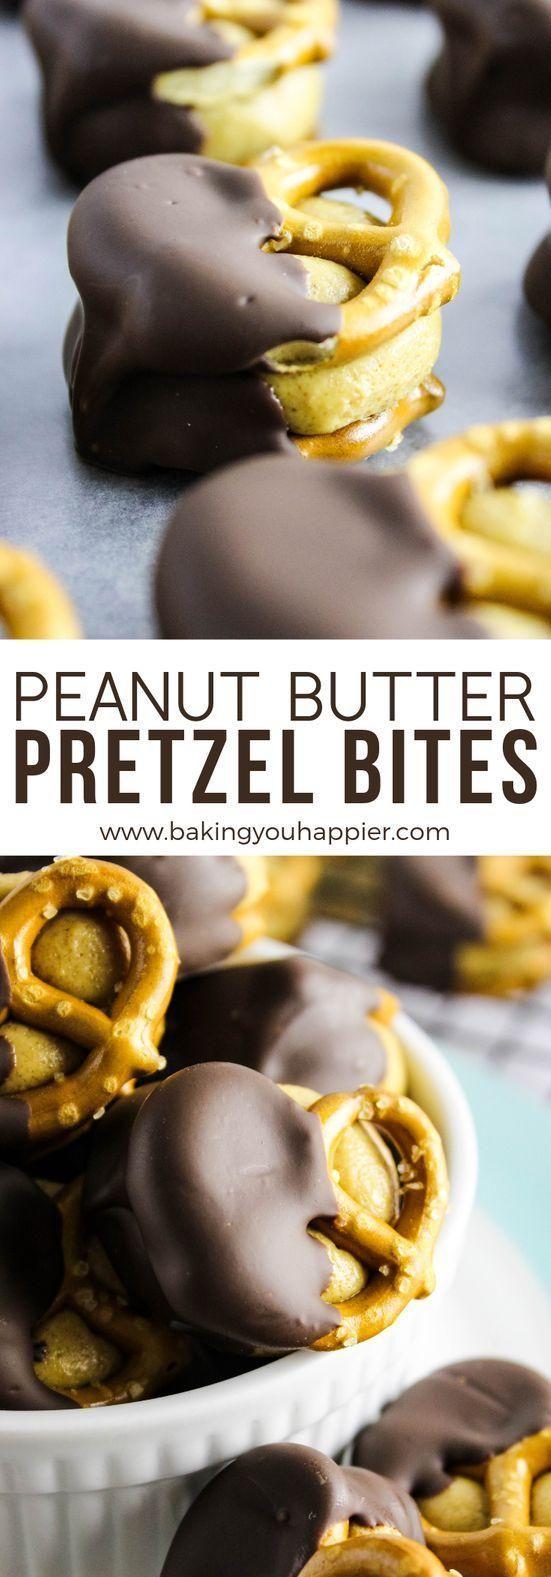 Vegan Chocolate Peanut Butter Pretzel Bites